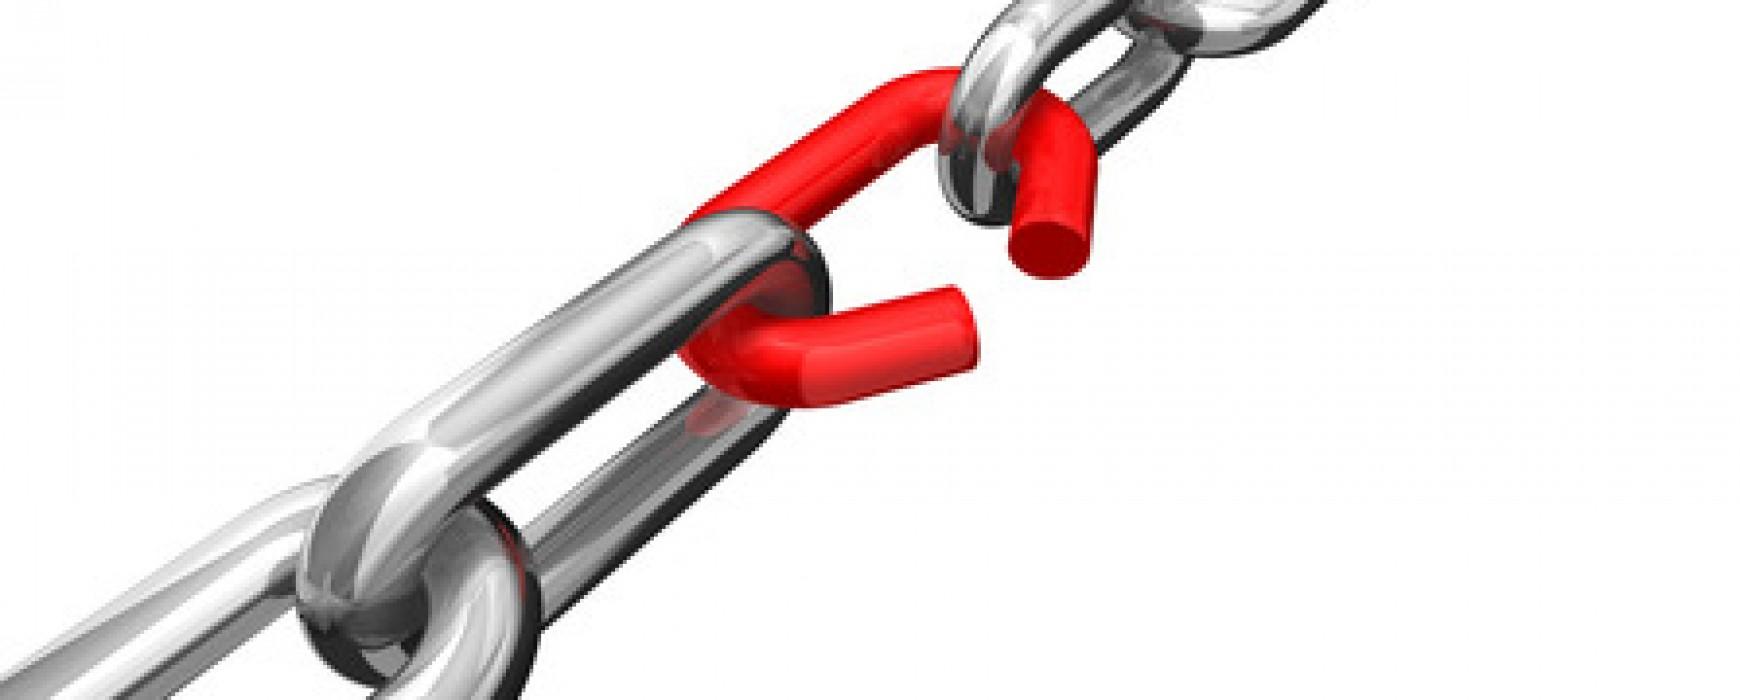 Neues Google-Tool entwertet Links